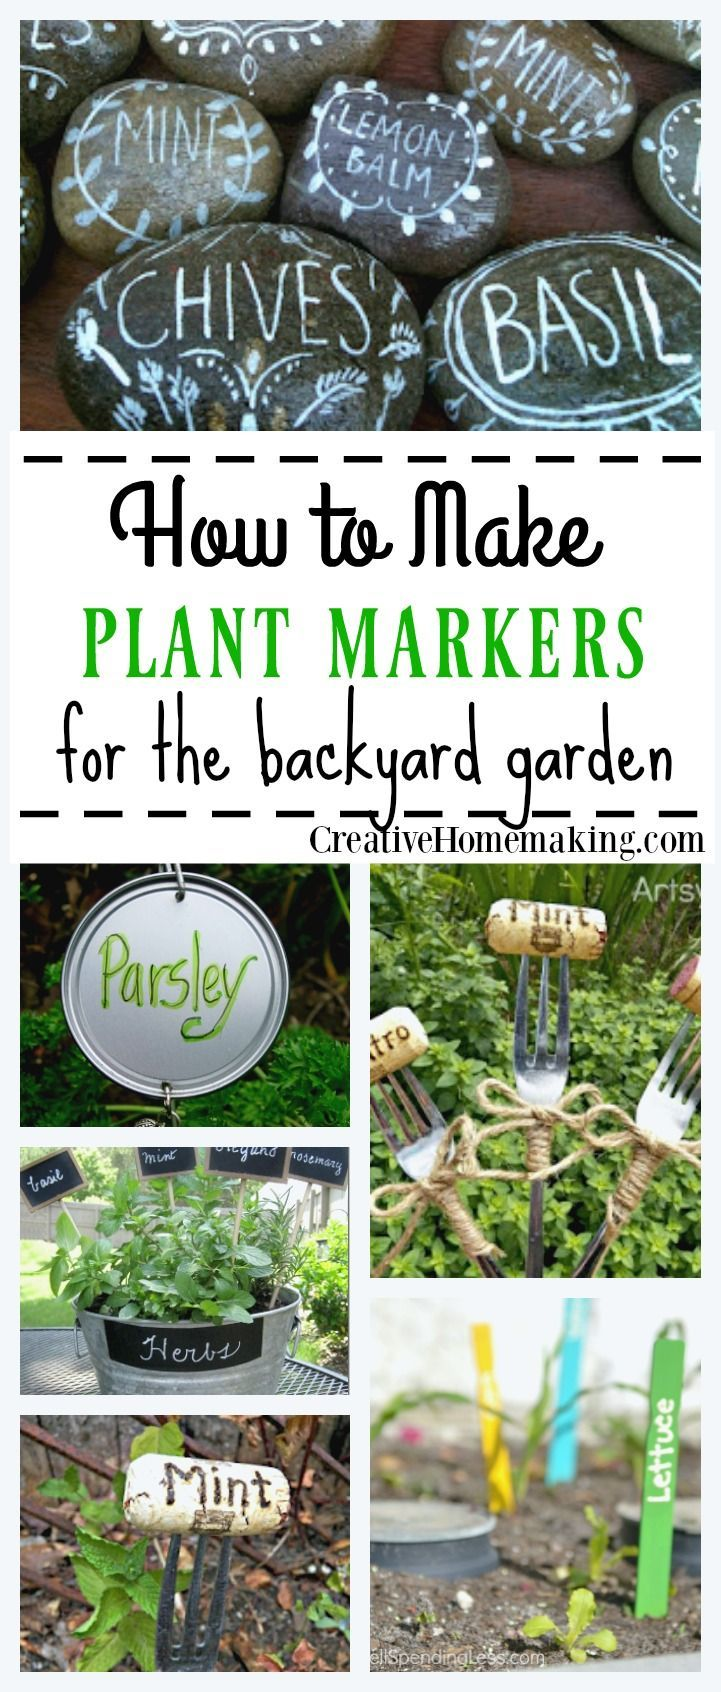 Creative Ideas For Making Homemade Plant Markers For Your Backyard Garden.  #backyardgardenideascreative